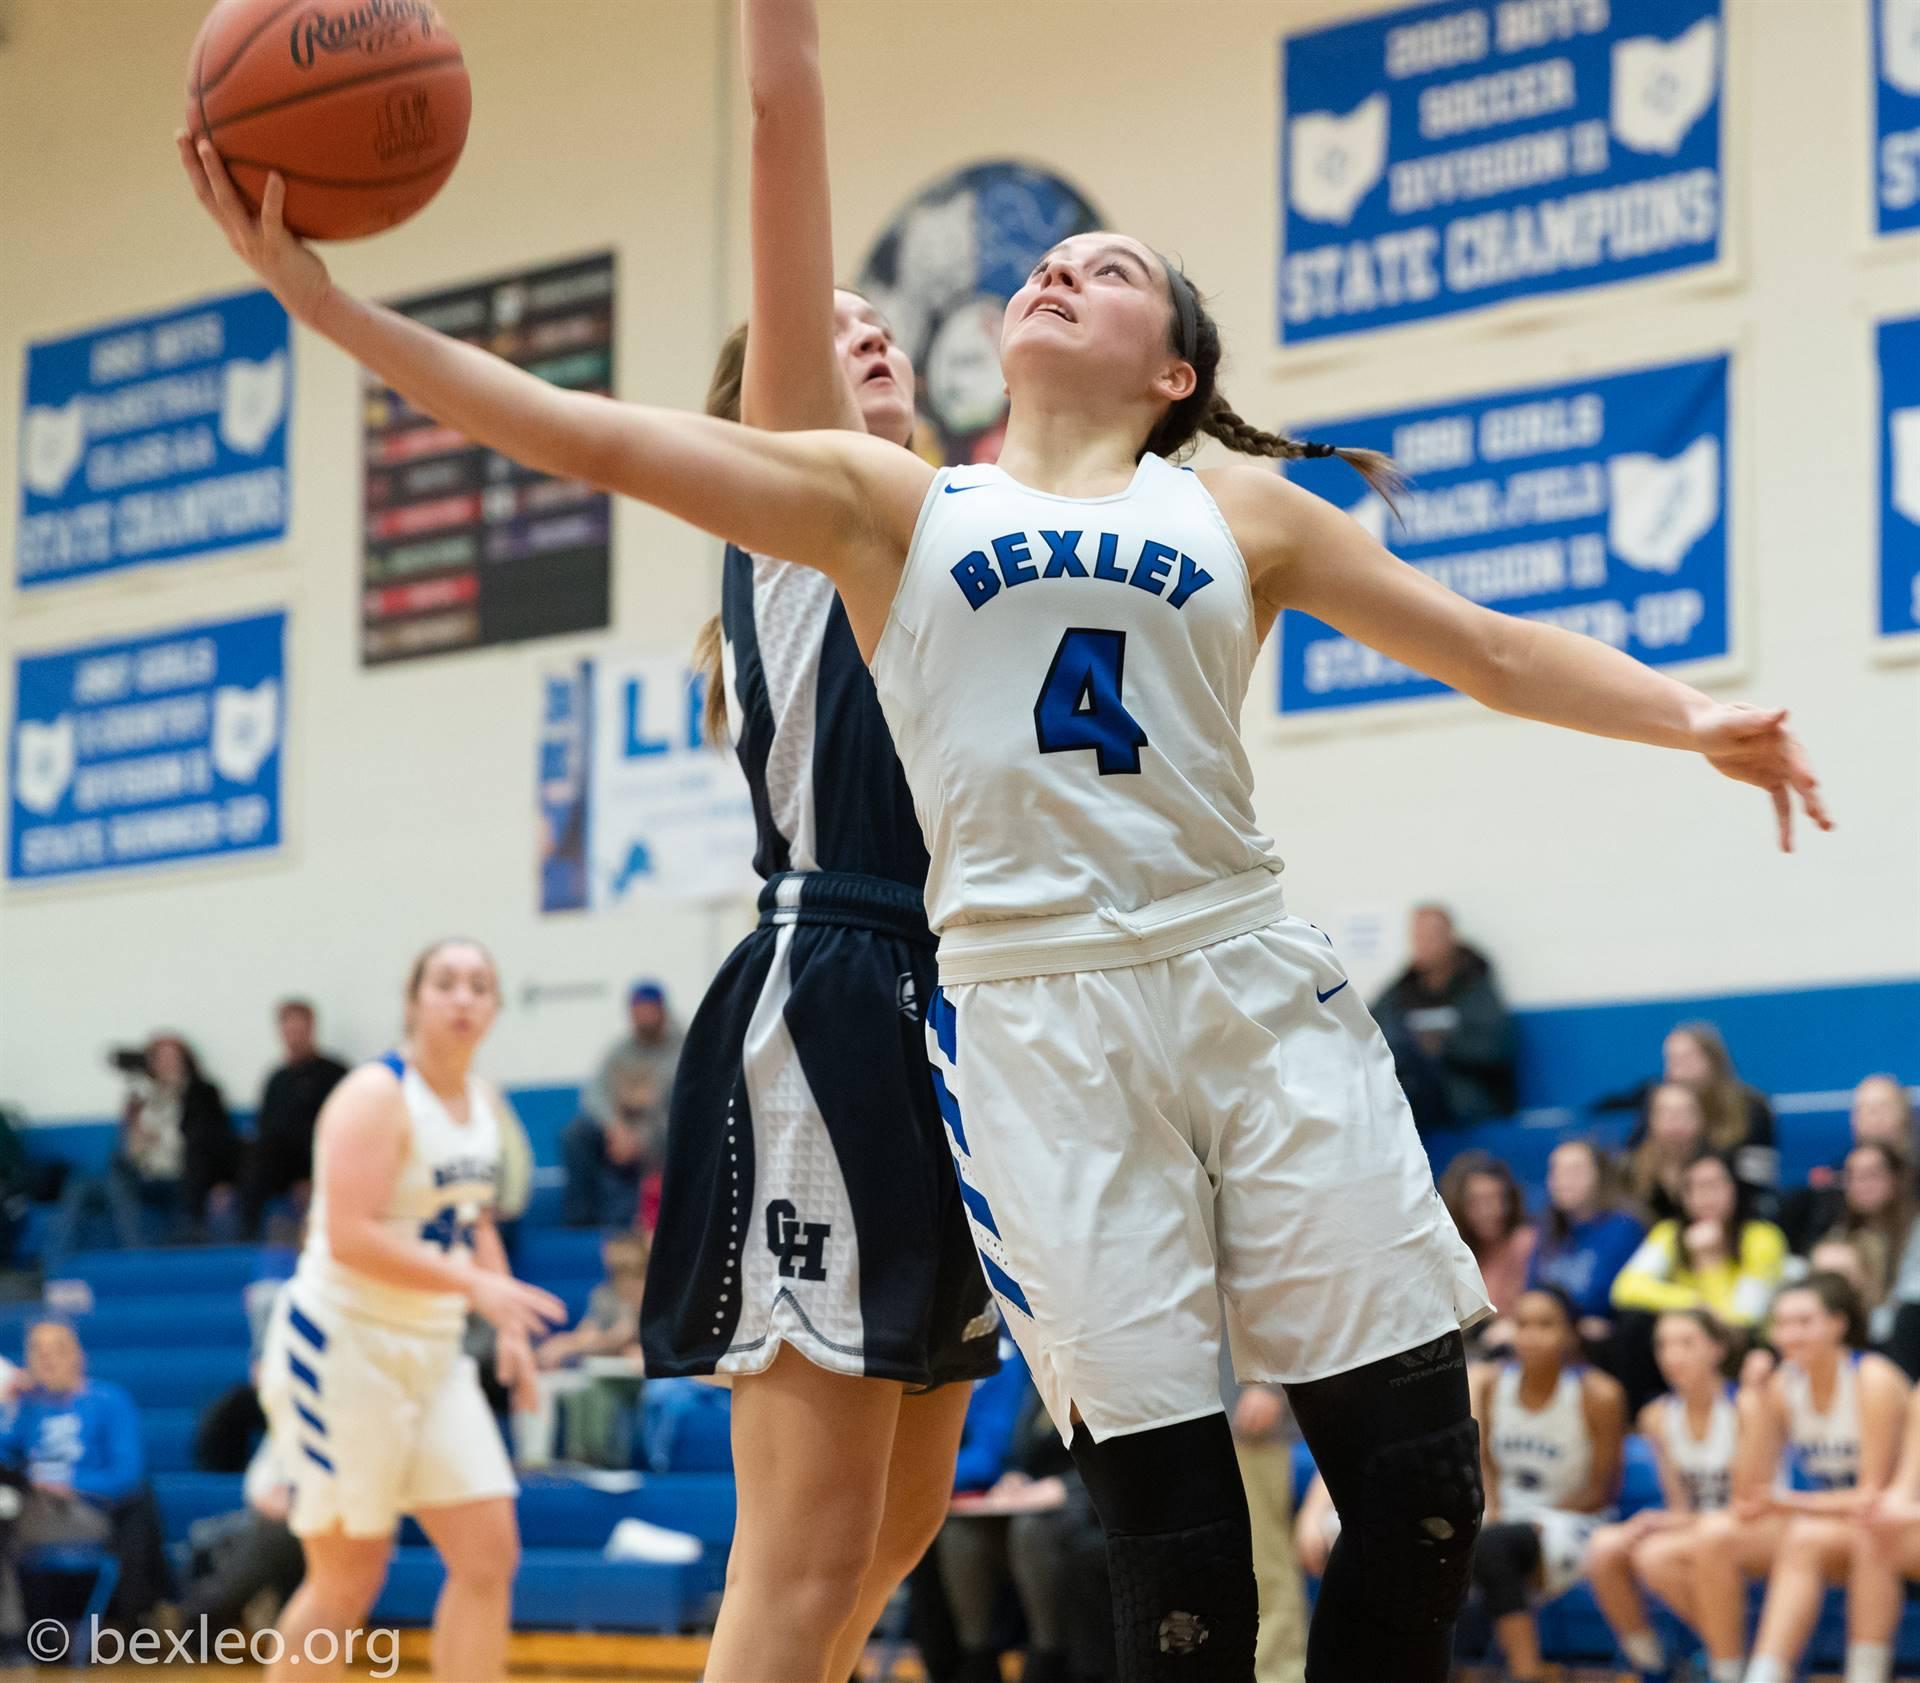 Girls Basketball Player drives baseline